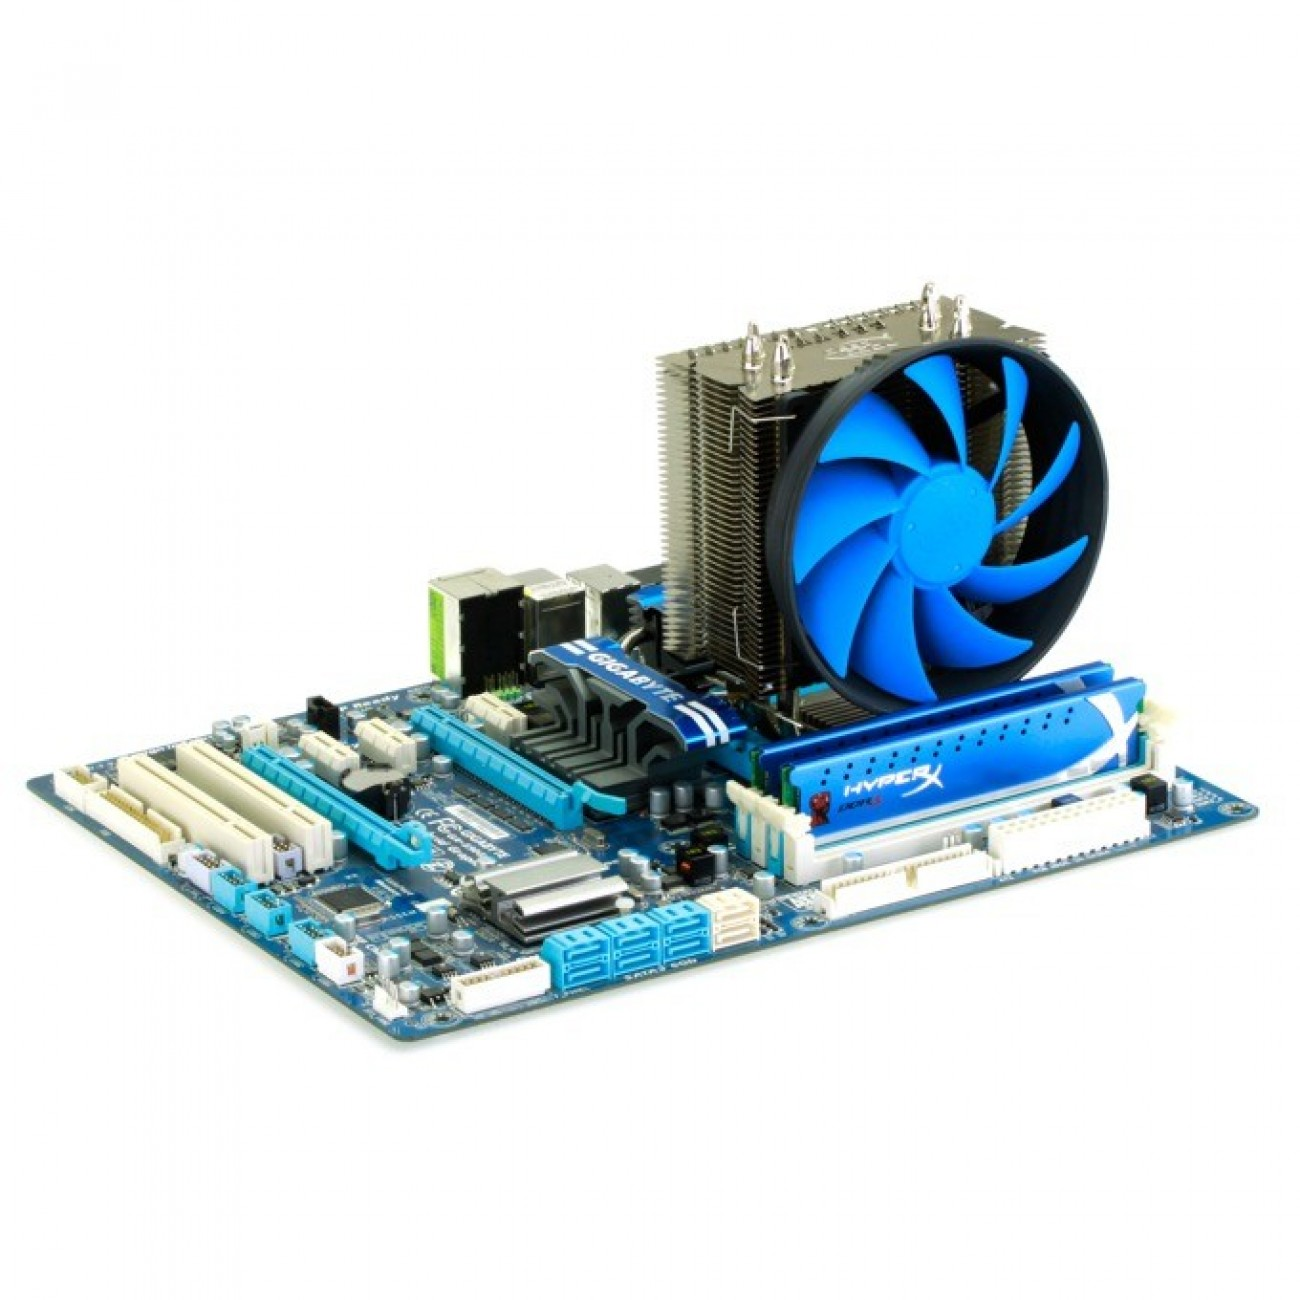 DeepCool GAMMAXX S40 за Intel и AMD процесори LGA2011/LGA1366/LGA1156/LGA1155/LGA1150/LGA775 & FM2/FM1/AM3+/AM3/AM2+/AM2/AMD K8 в Процесори Охладители -    Alleop